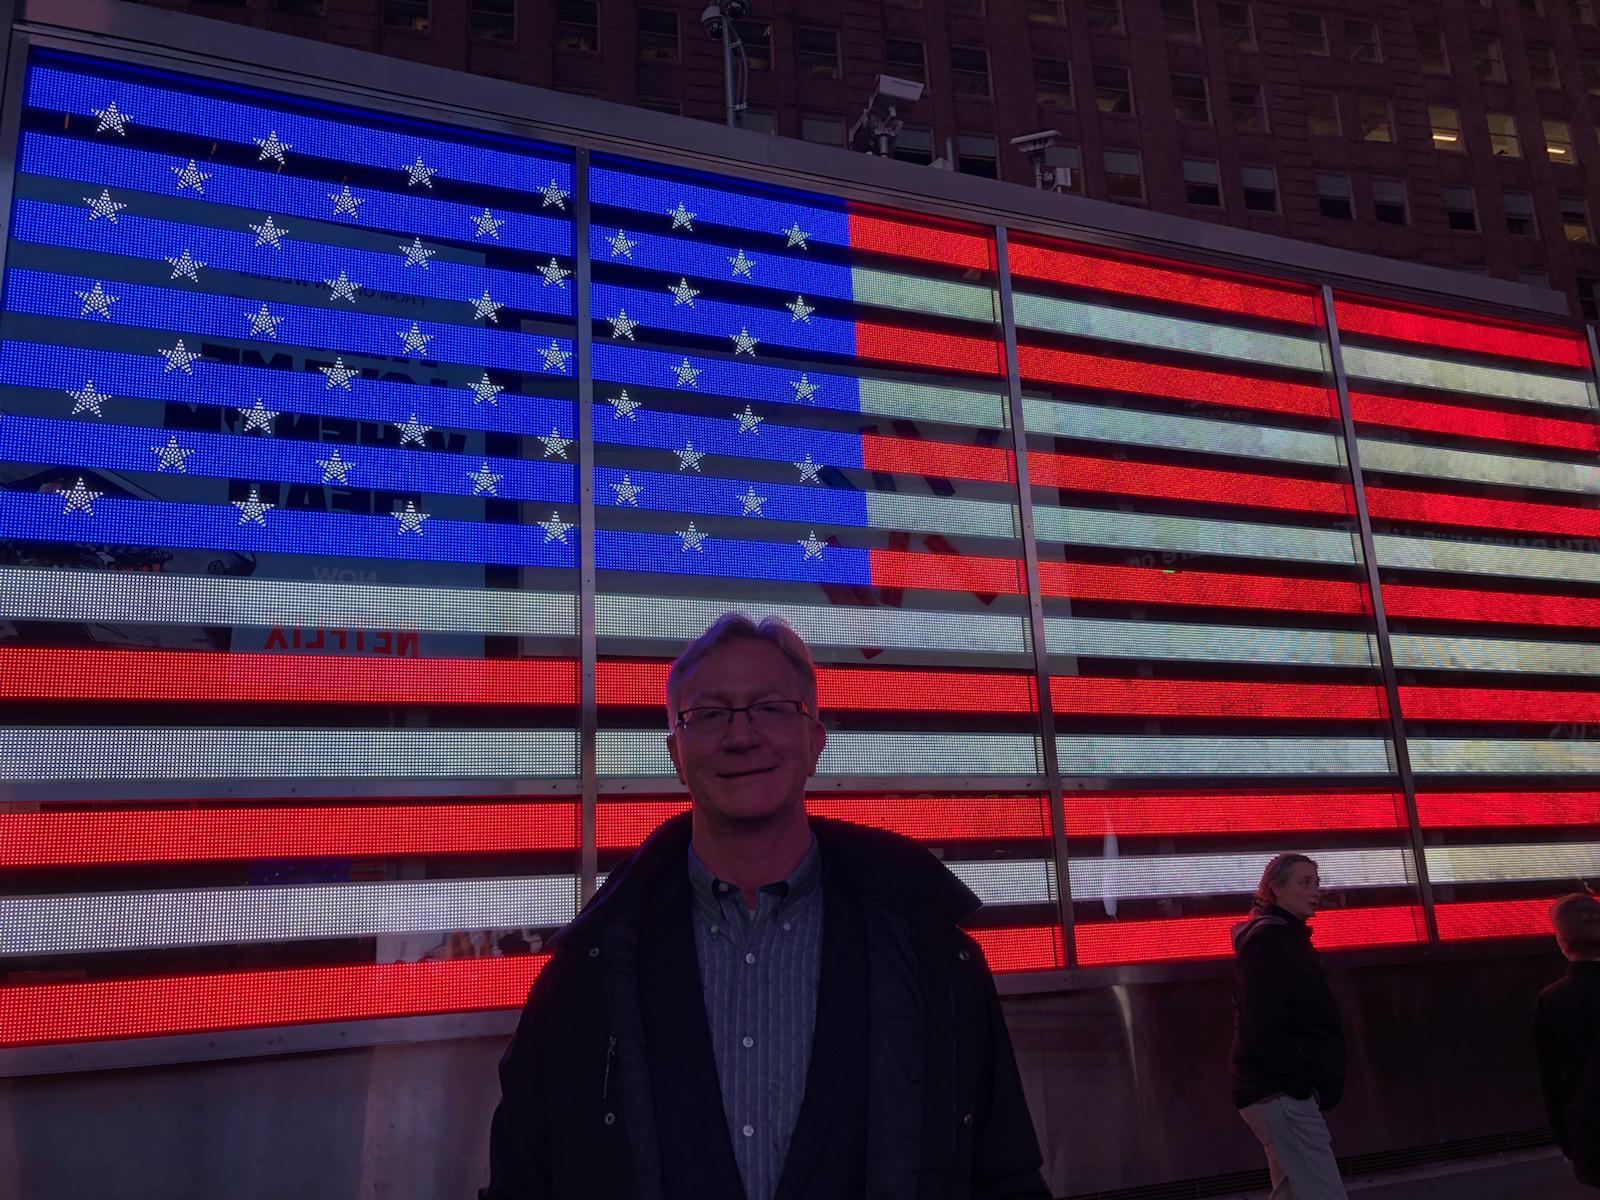 Rodney Reider in Midtown New York